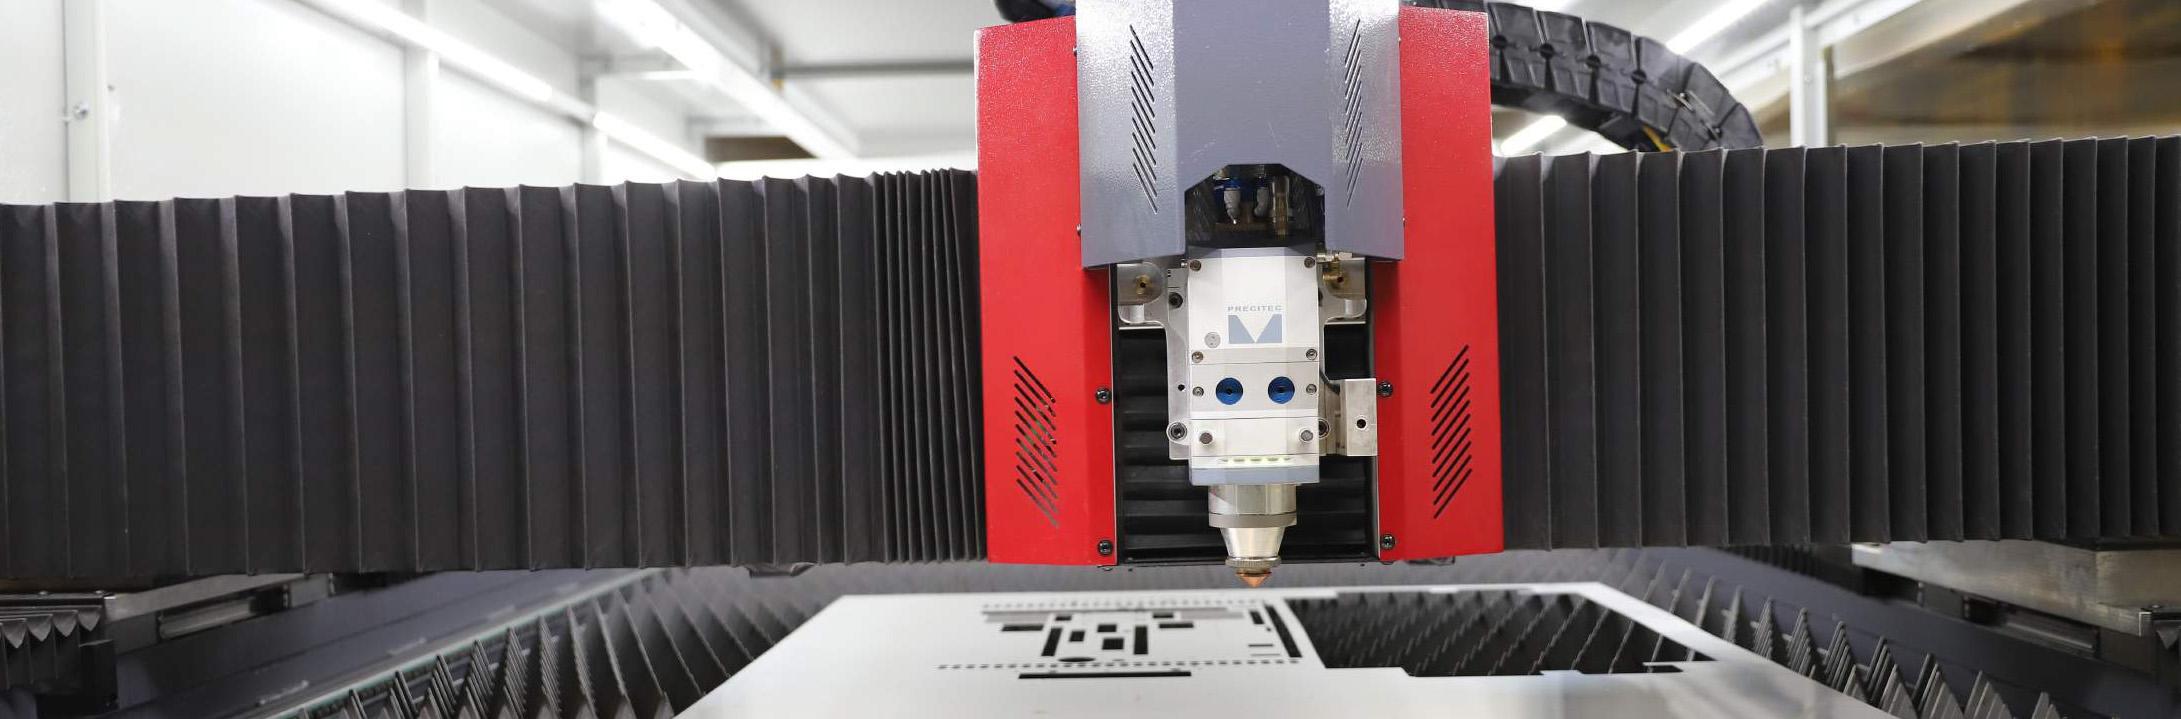 Compact Fibre Laser - coming soon